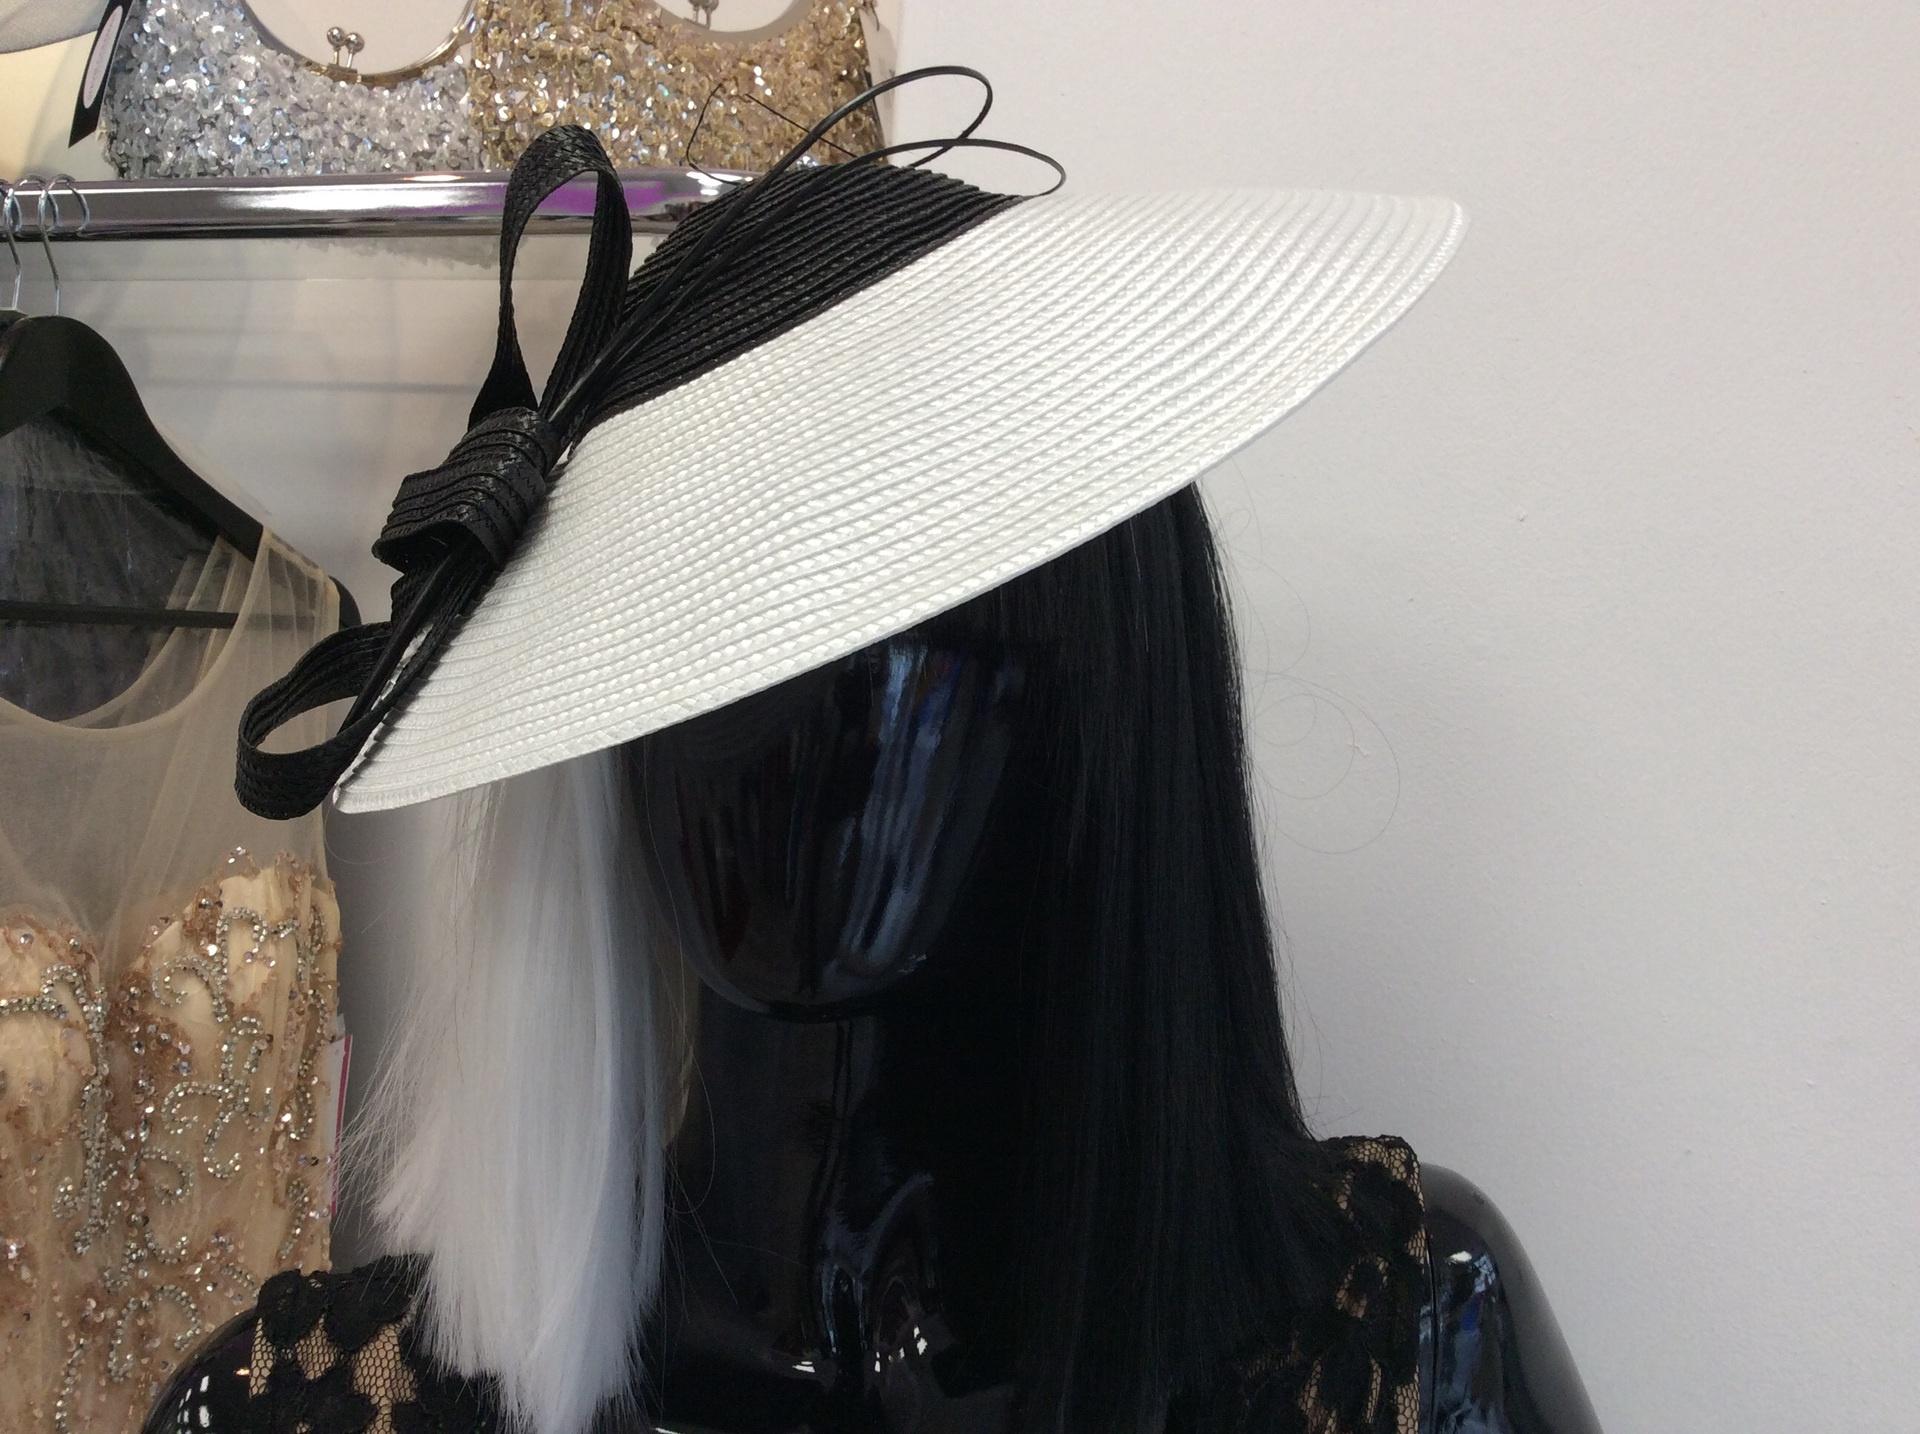 Stunning white and black headpiece